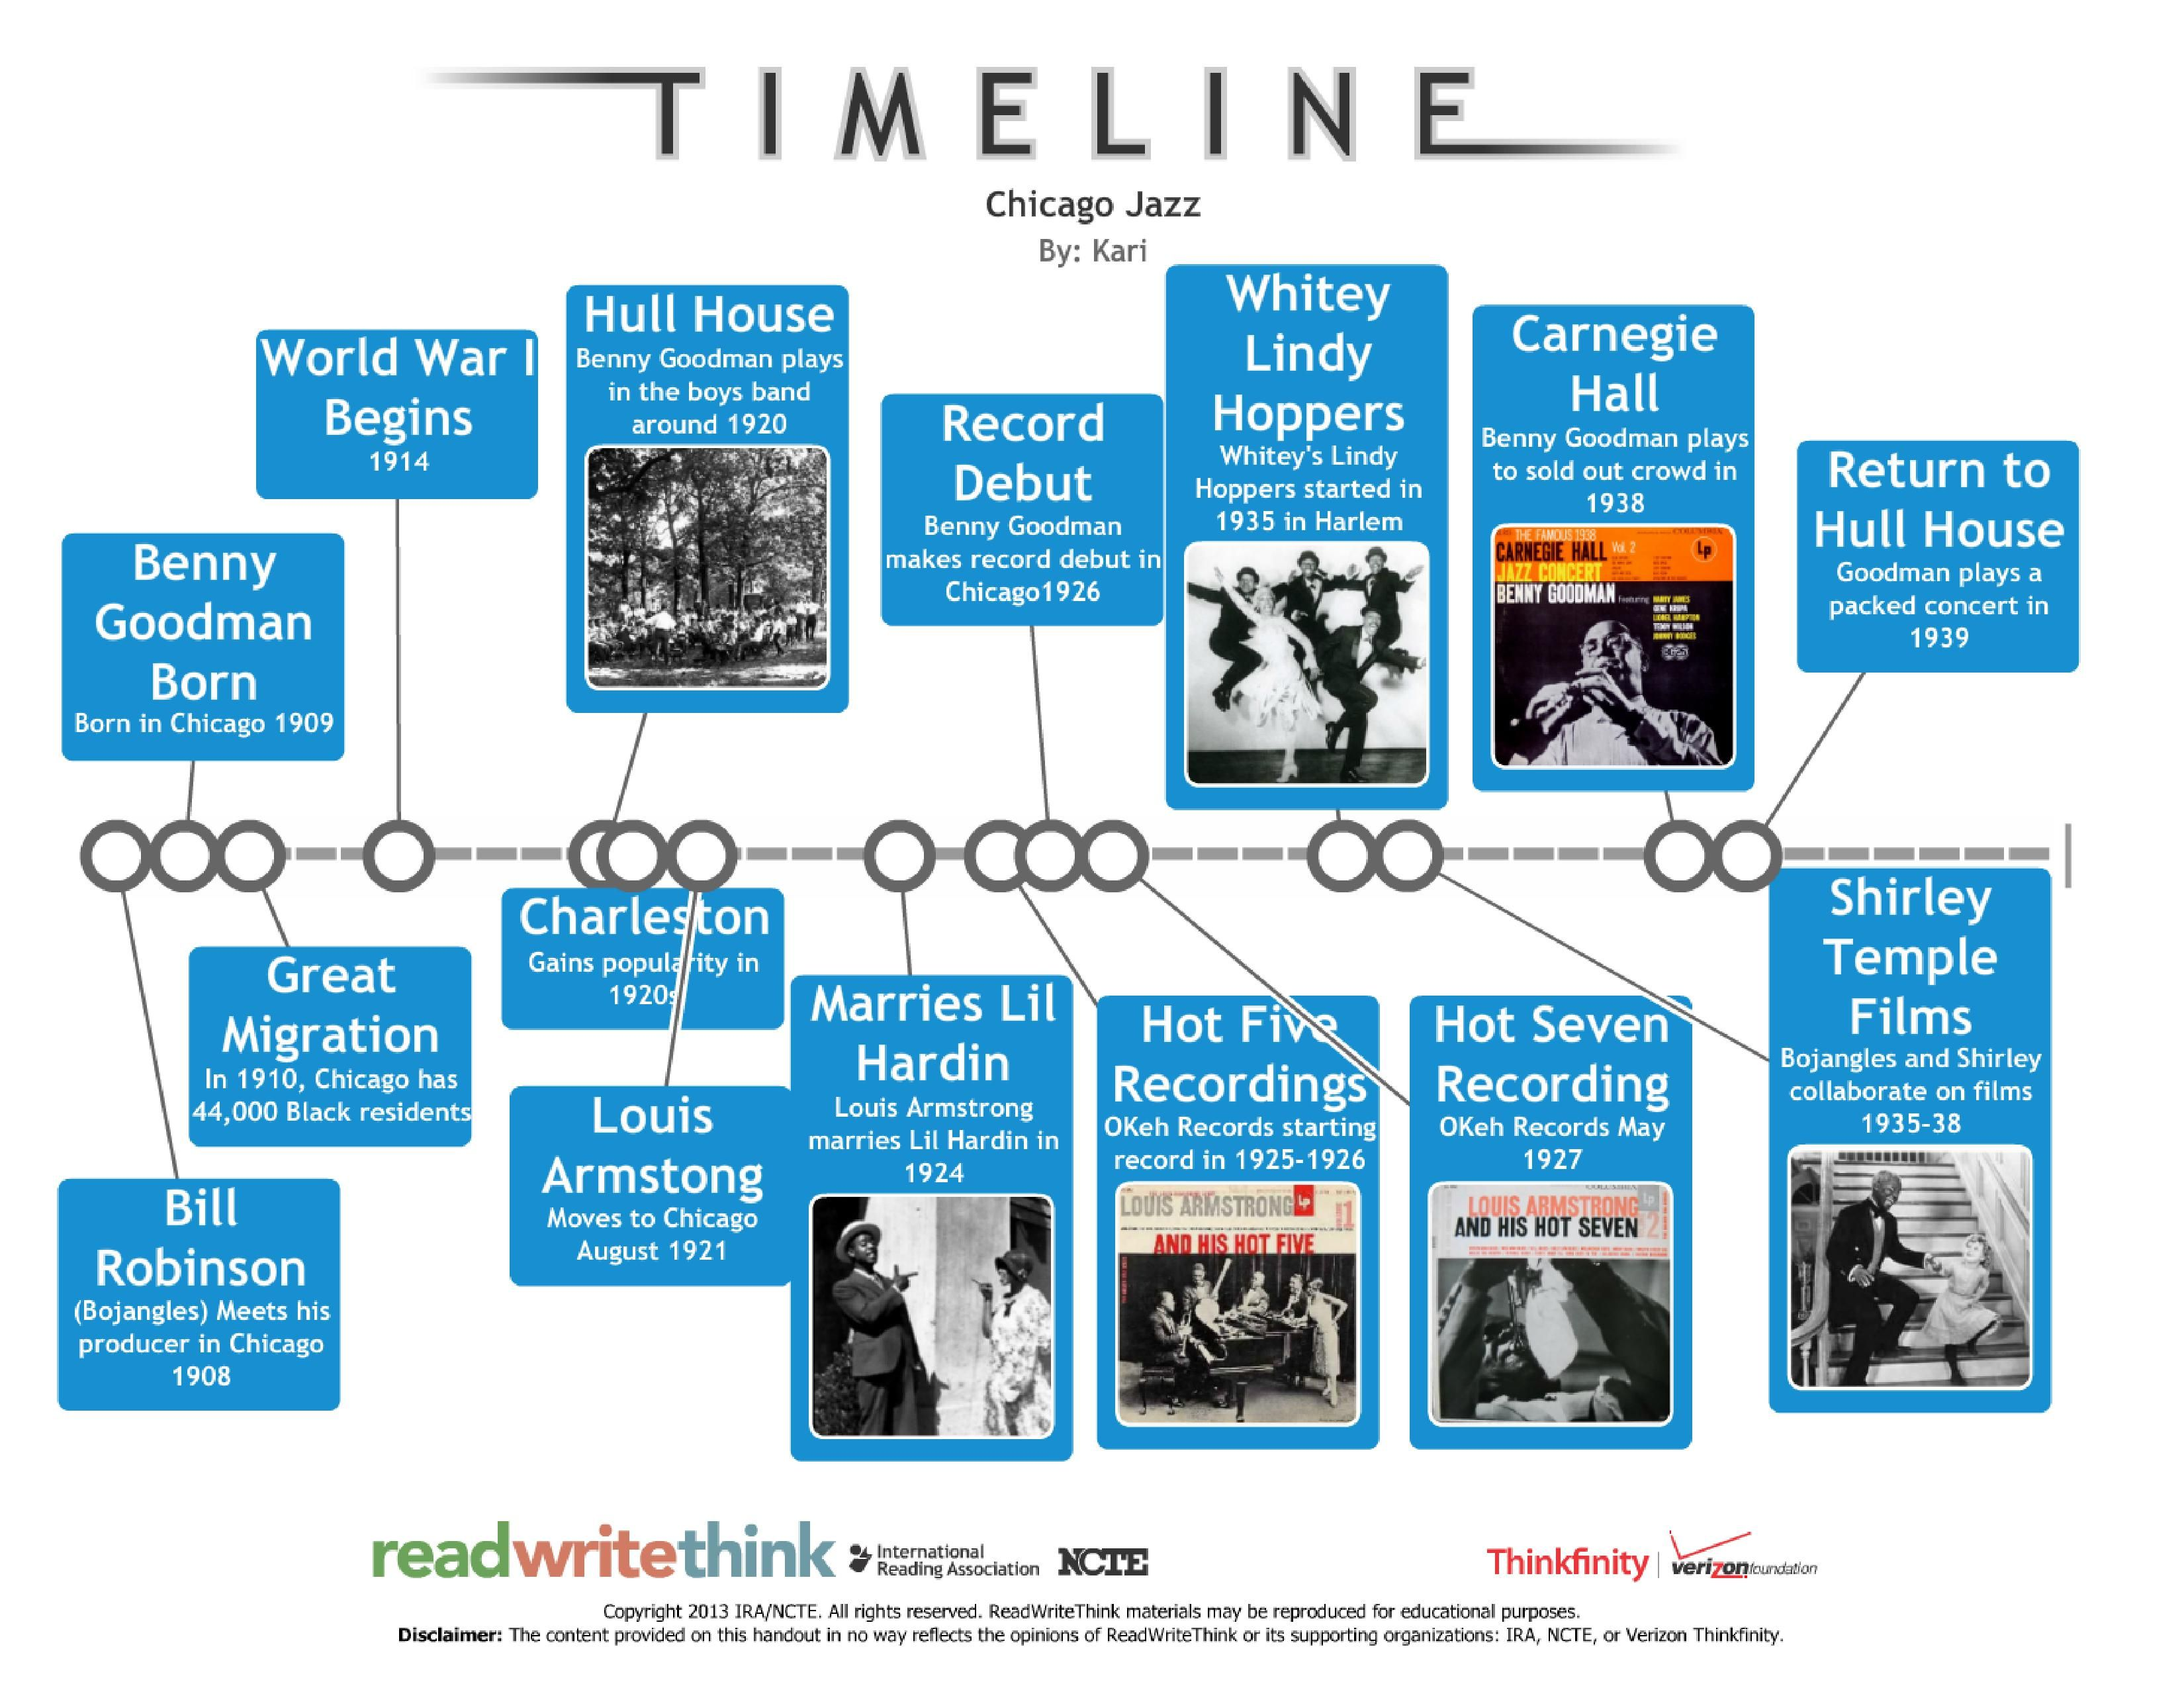 Timeline Of Chicago Jazz Important Dates